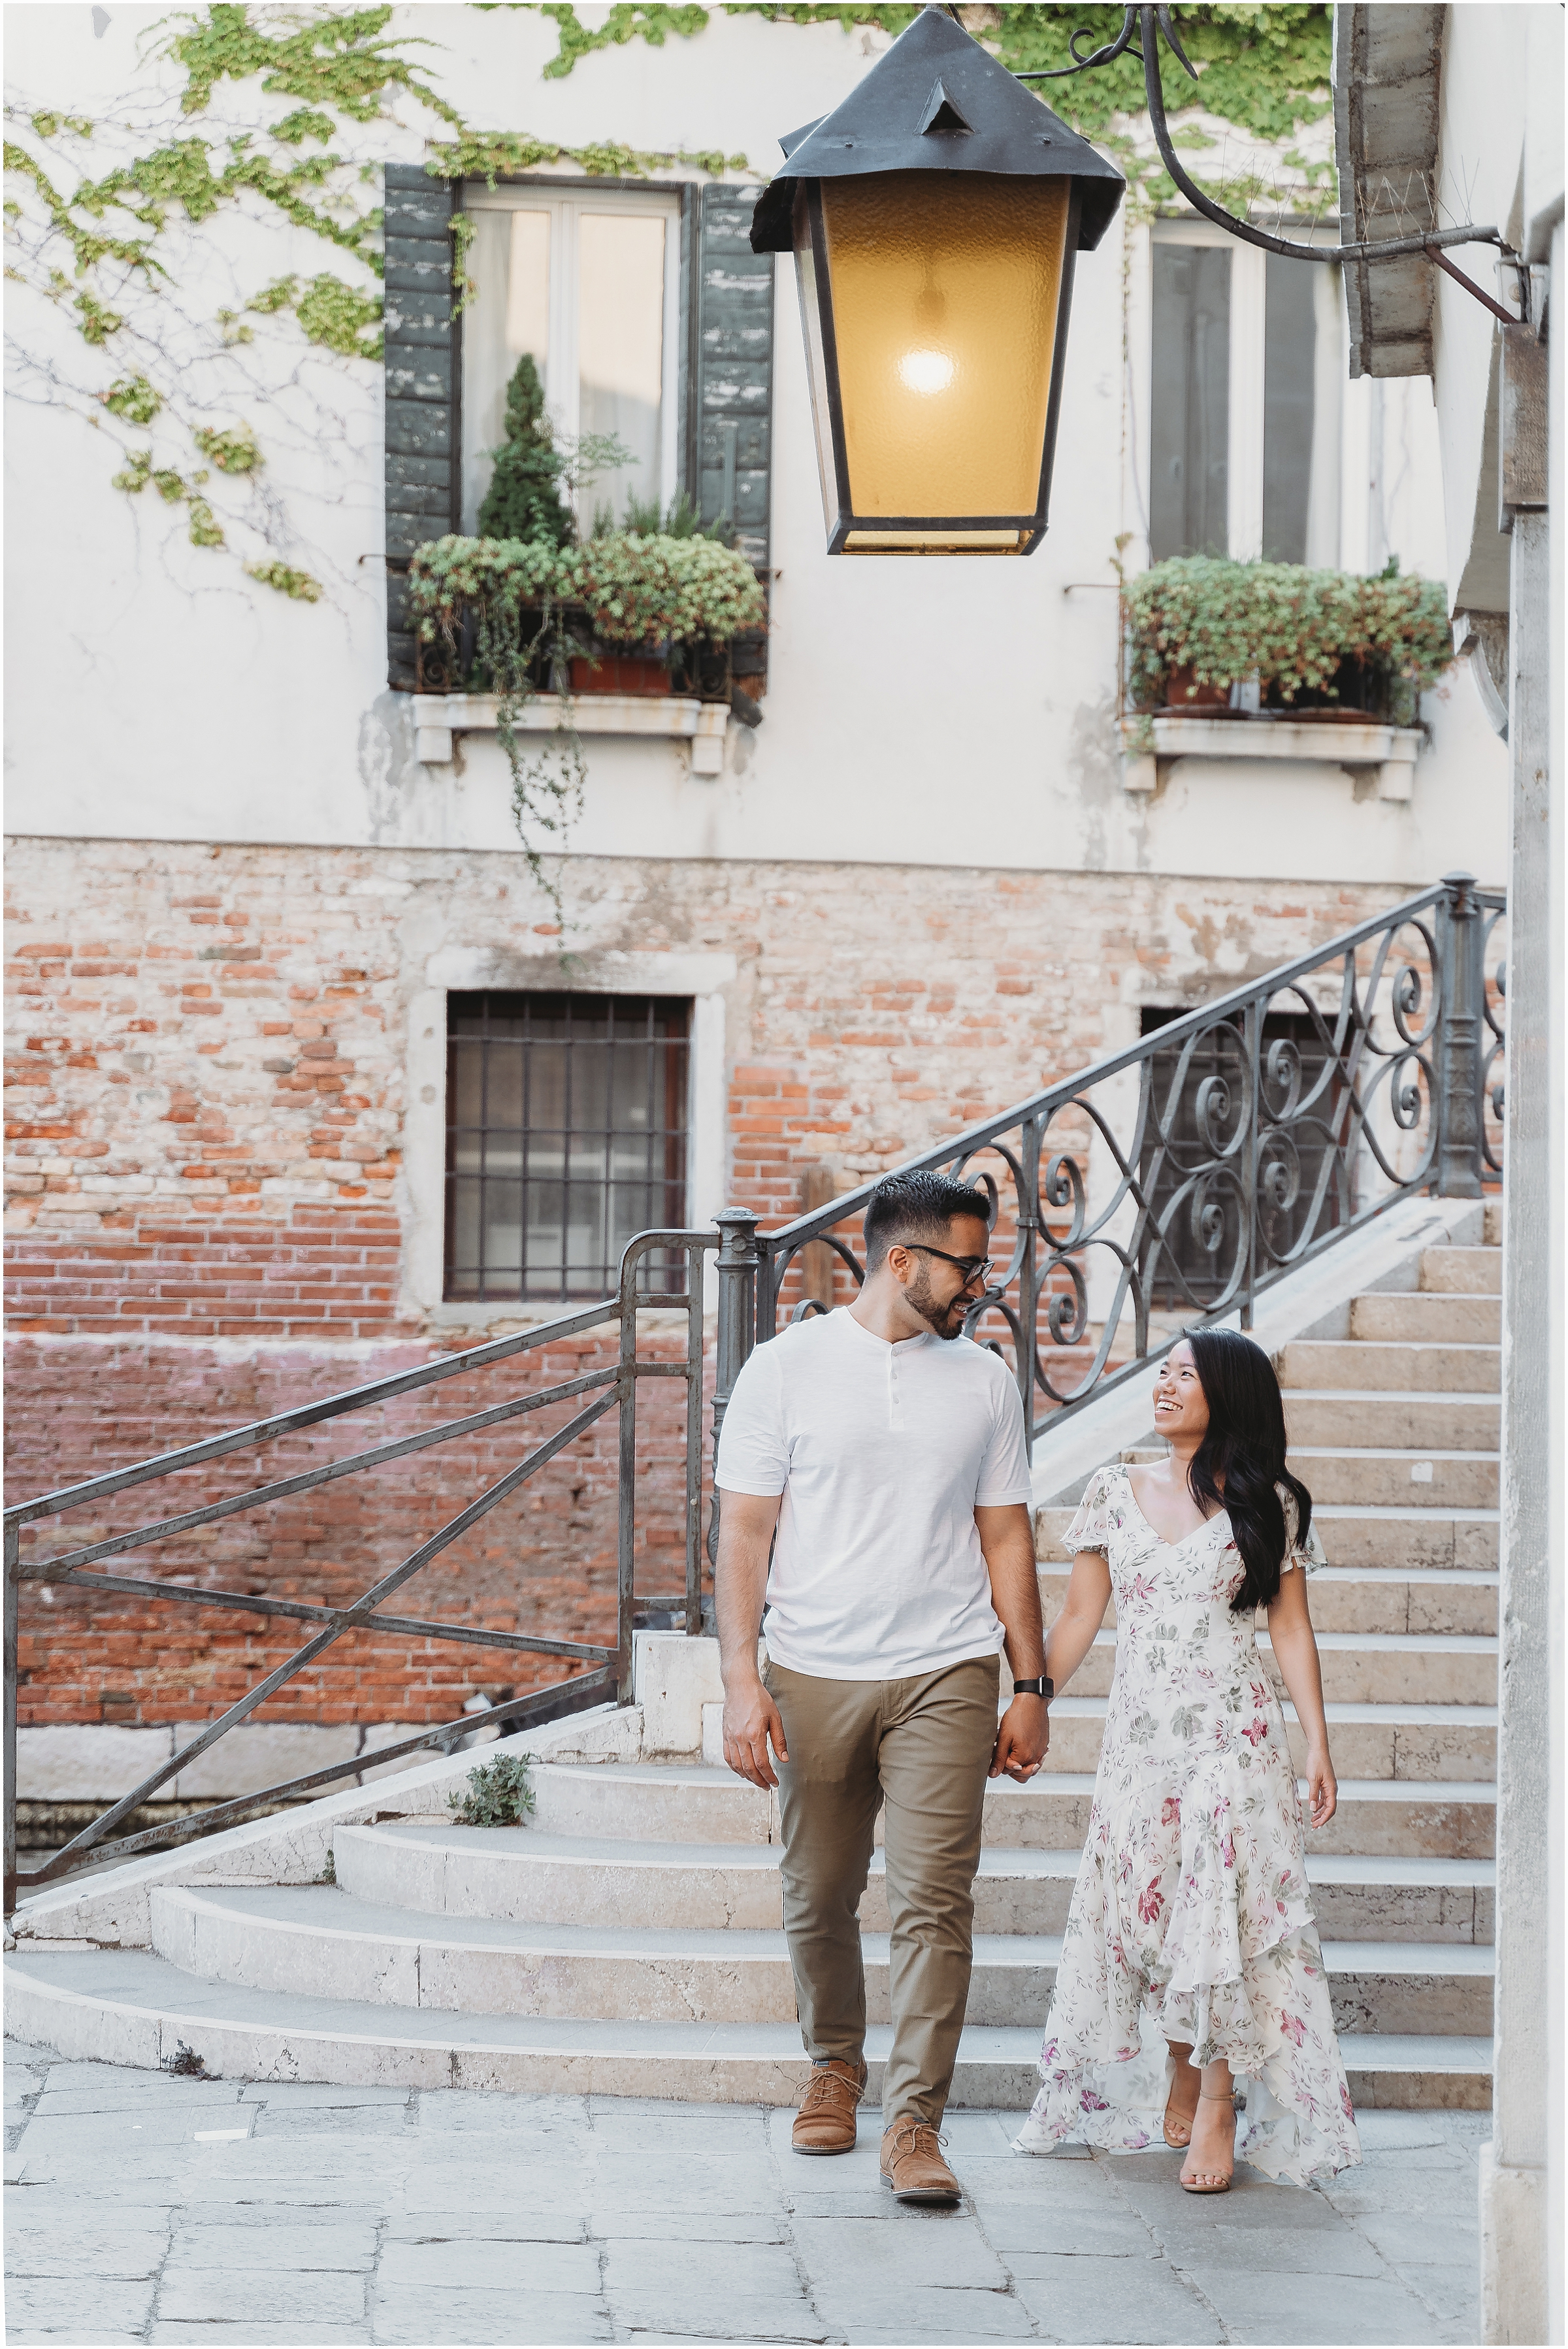 photographer-in-venice-elopement-shooting-Venice-couple_06.jpg